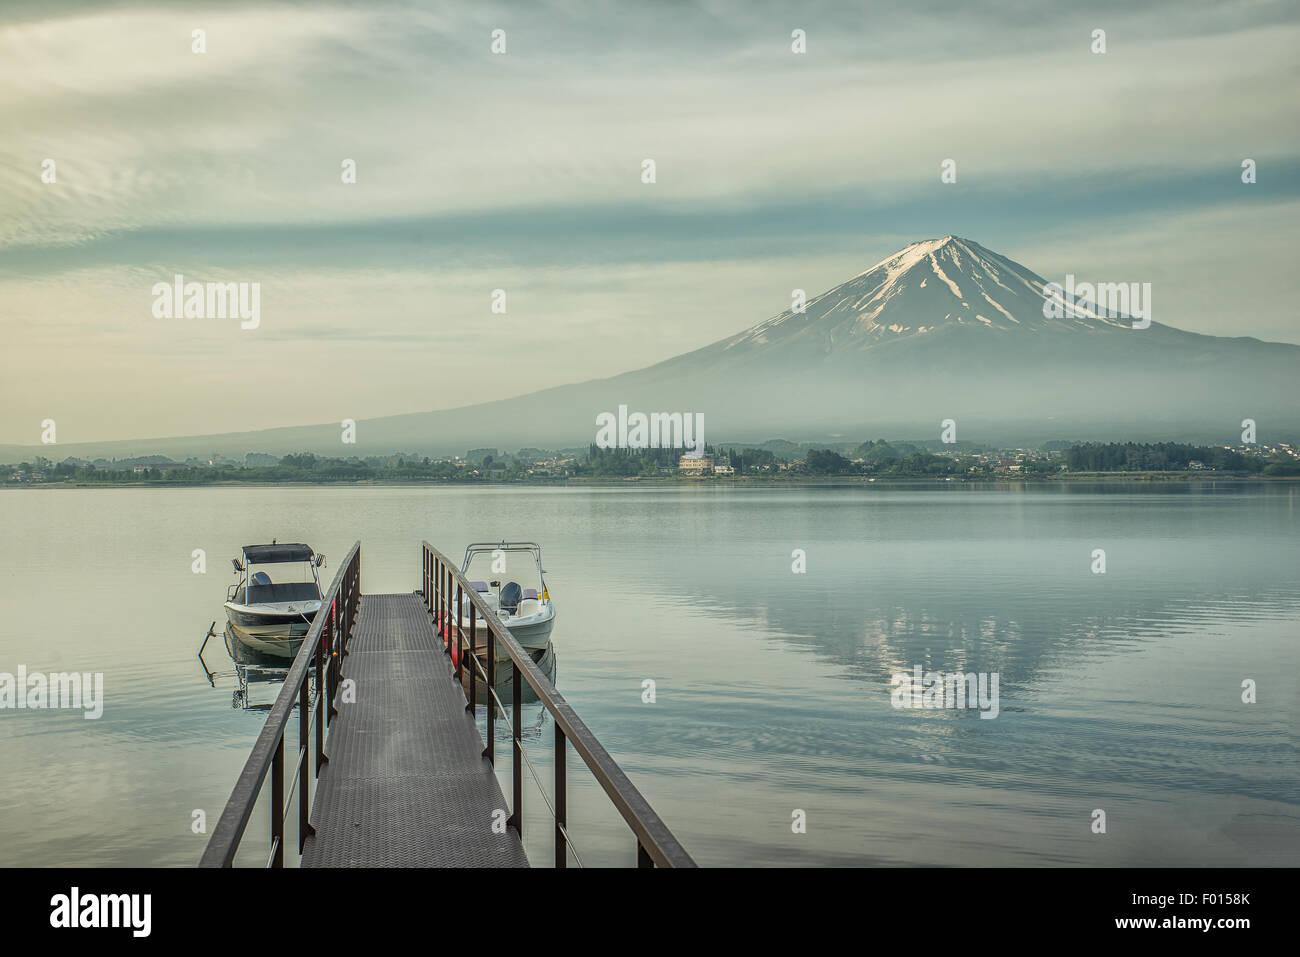 Mt.Fuji e jetty in Kawaguchiko, Giappone Immagini Stock